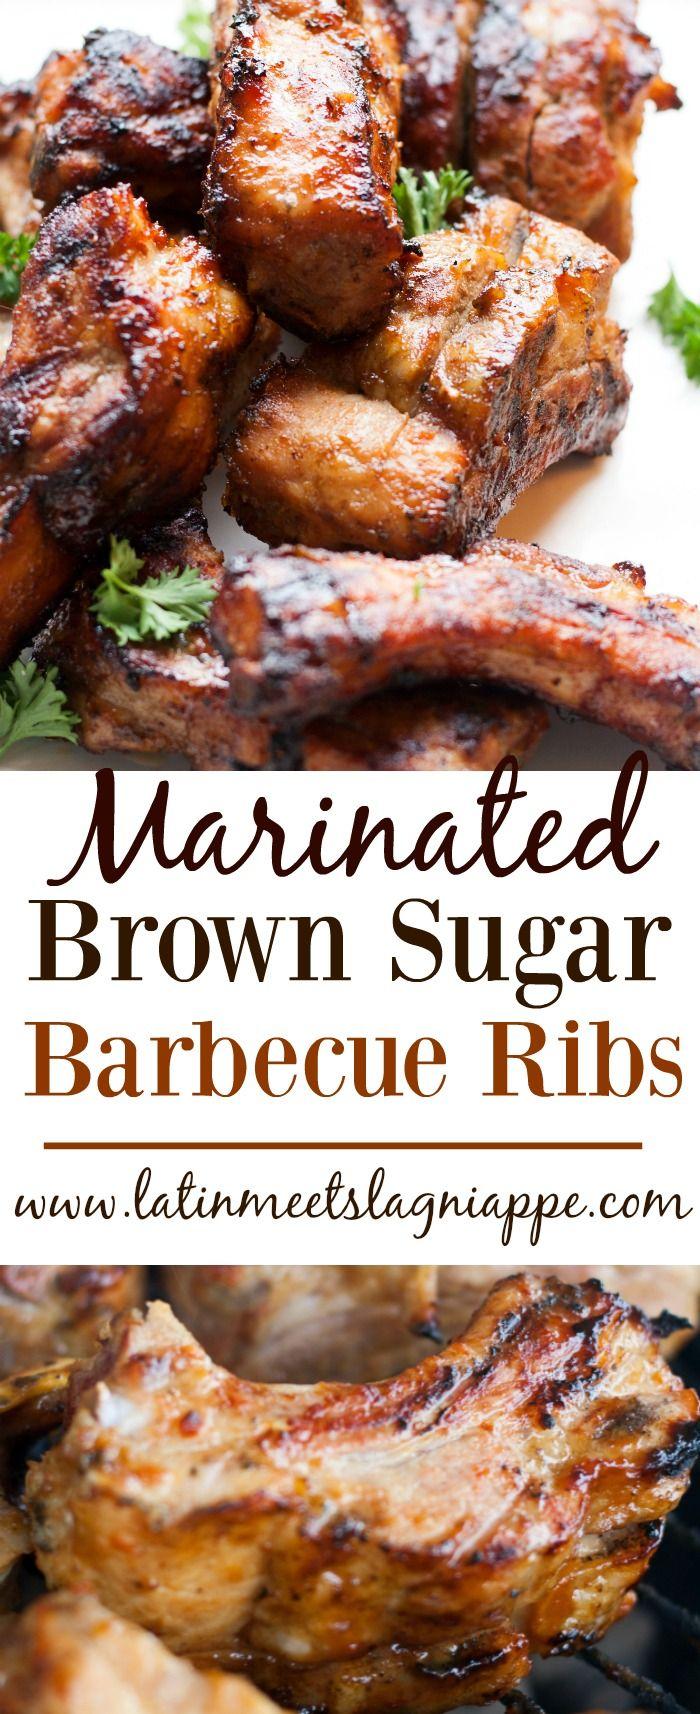 #Ad #HogWildThrowdown Marinated Brown Sugar Barbecue Ribs - such a delicious way to enjoy ribs!